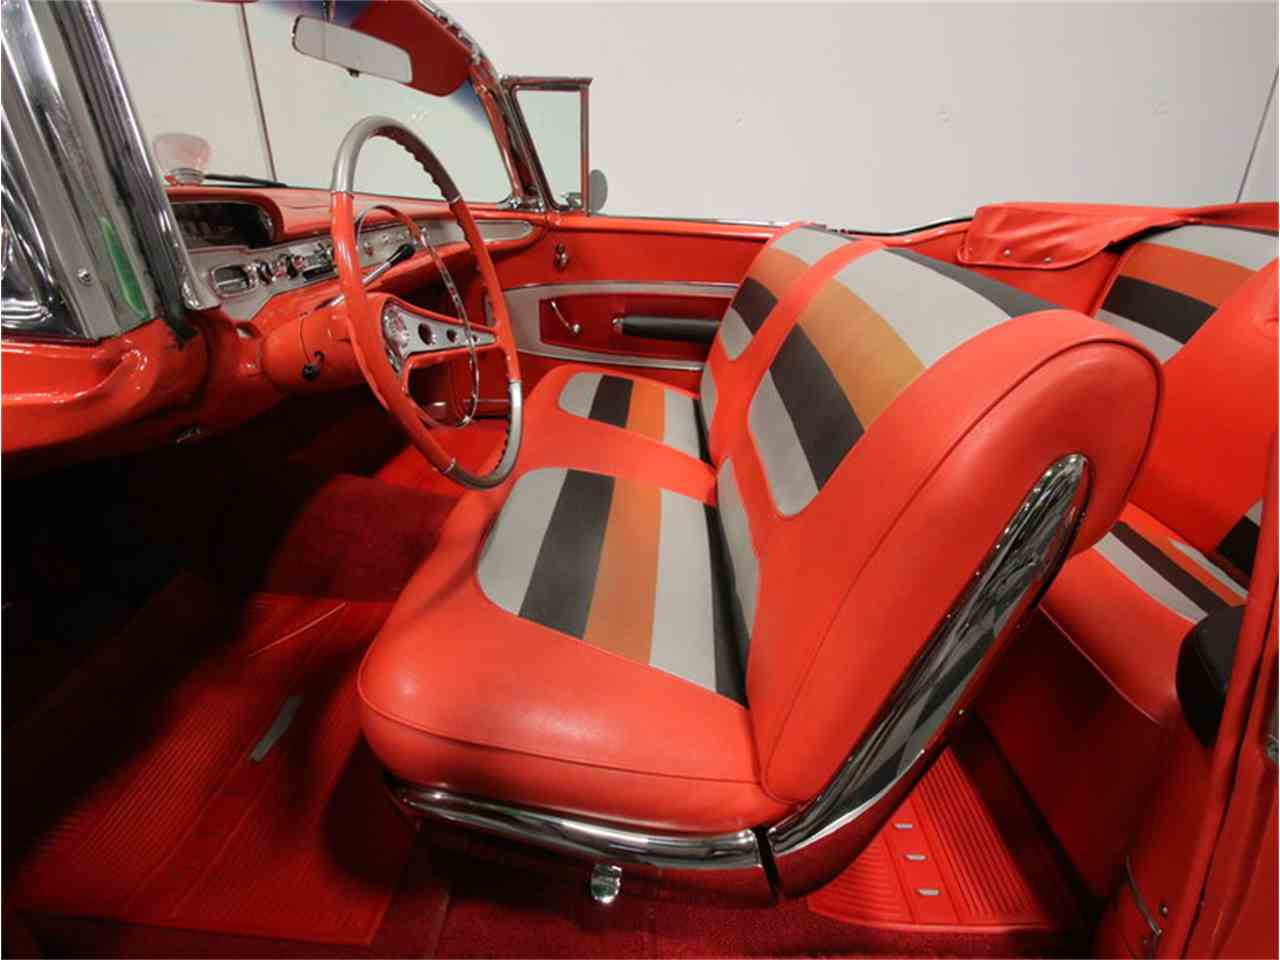 Large Picture of '58 Chevrolet Impala - $106,995.00 - EVGO